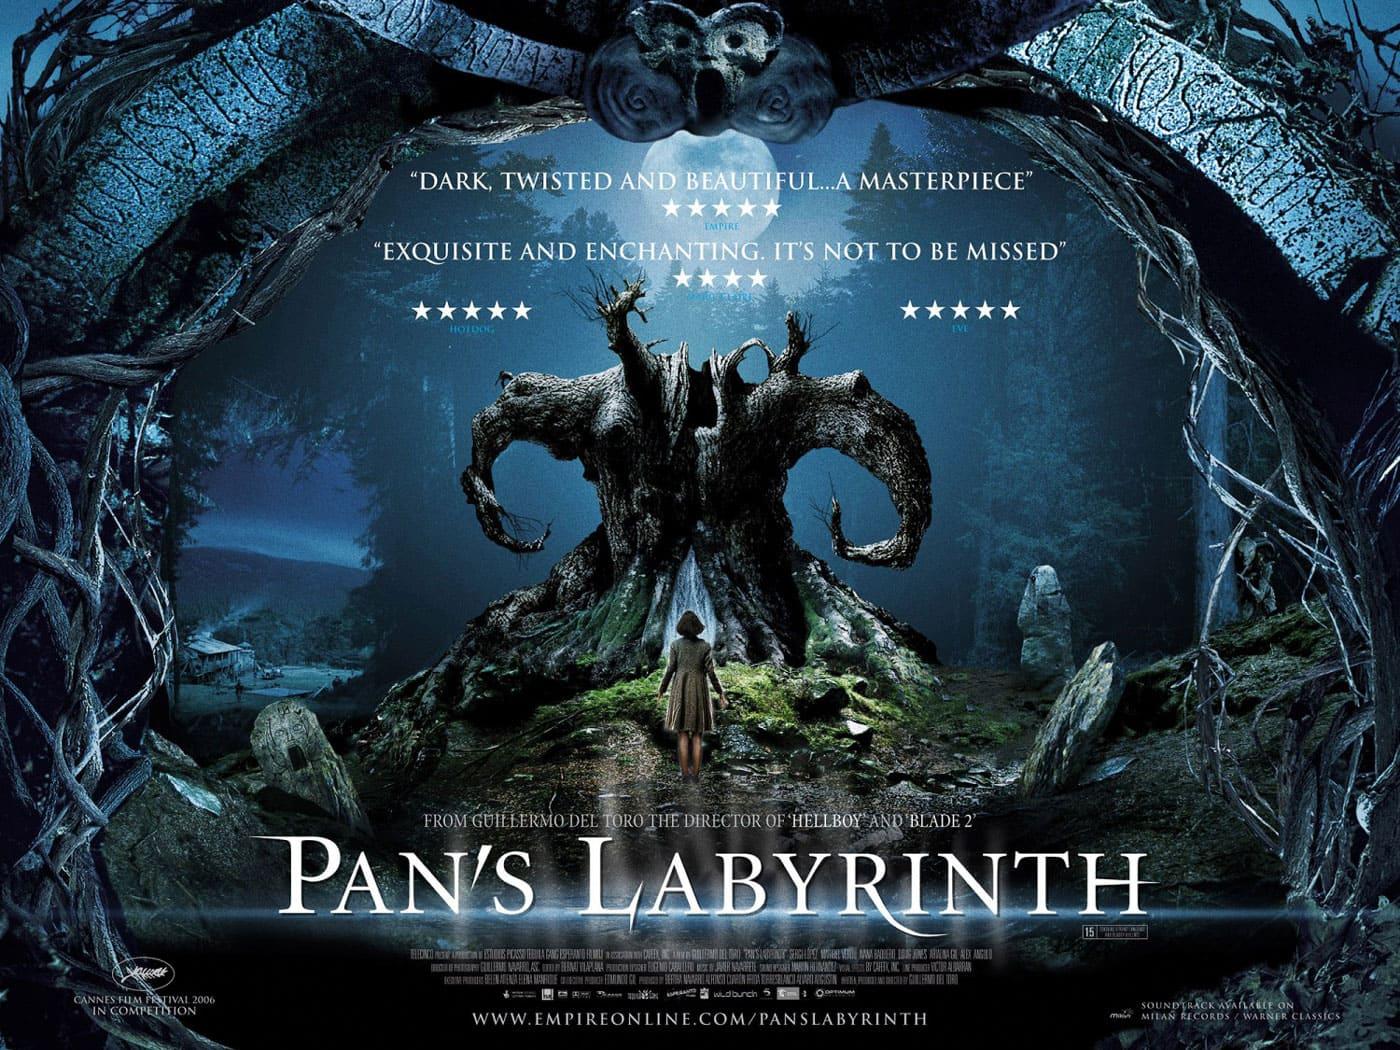 Película - Pan's Labyrinth - Guillermo del Toro (2006)